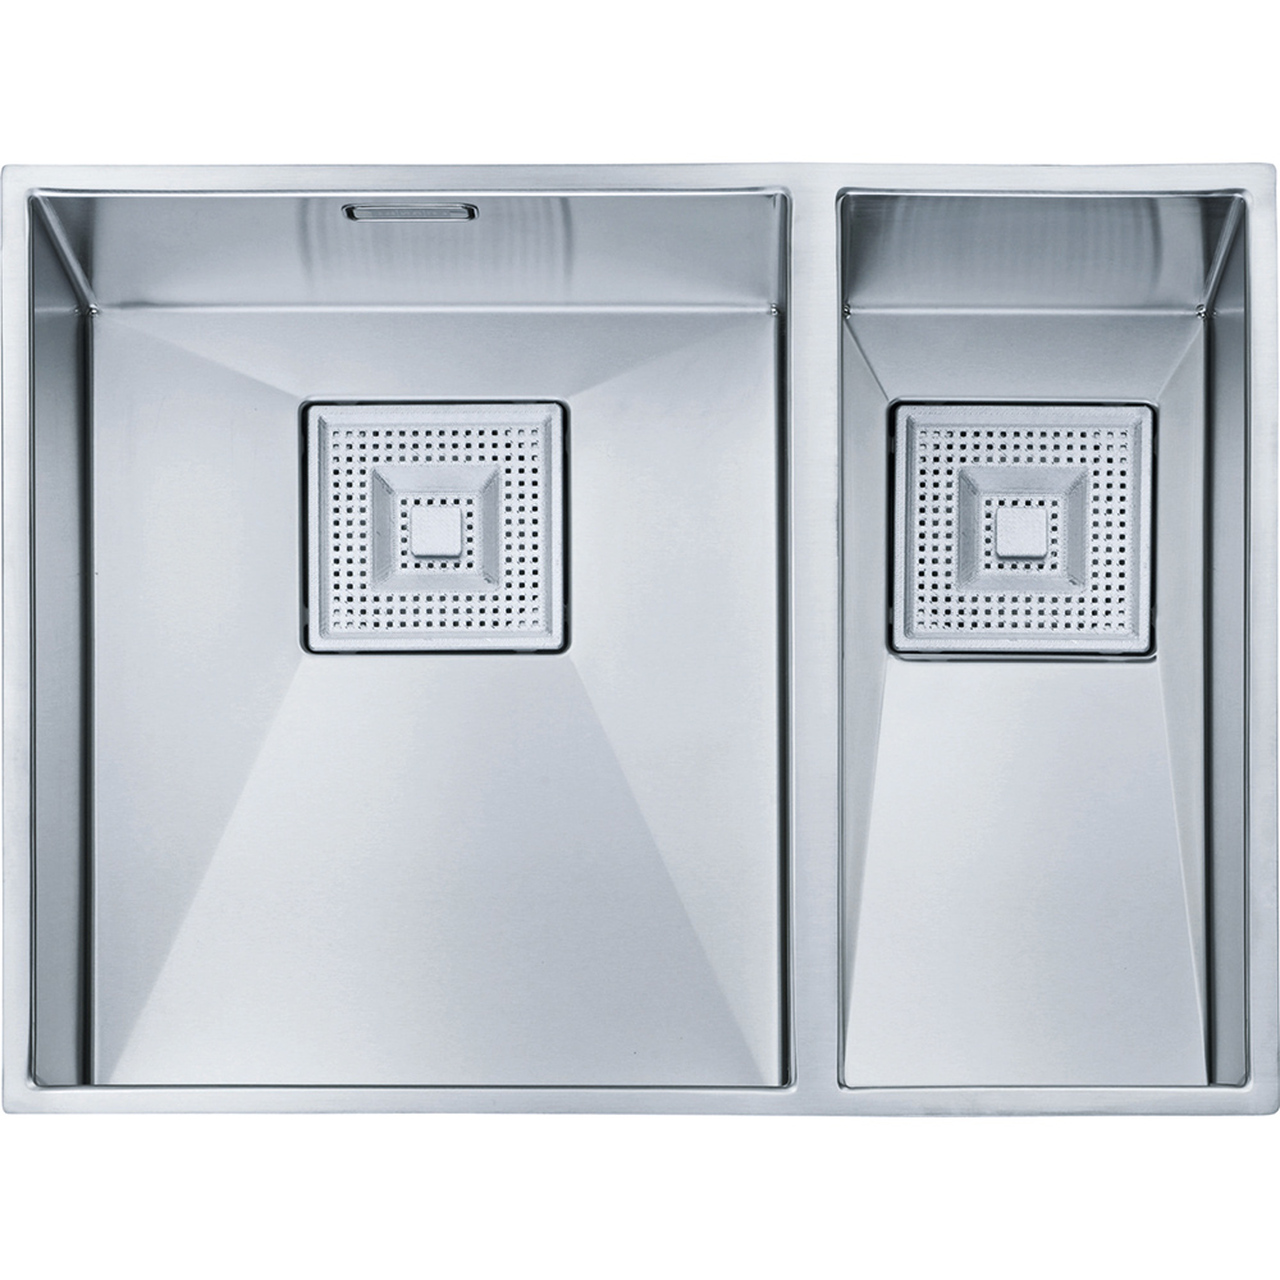 Franke Peak PKX160 34-18 Stainless Steel Kitchen Sink - Sinks